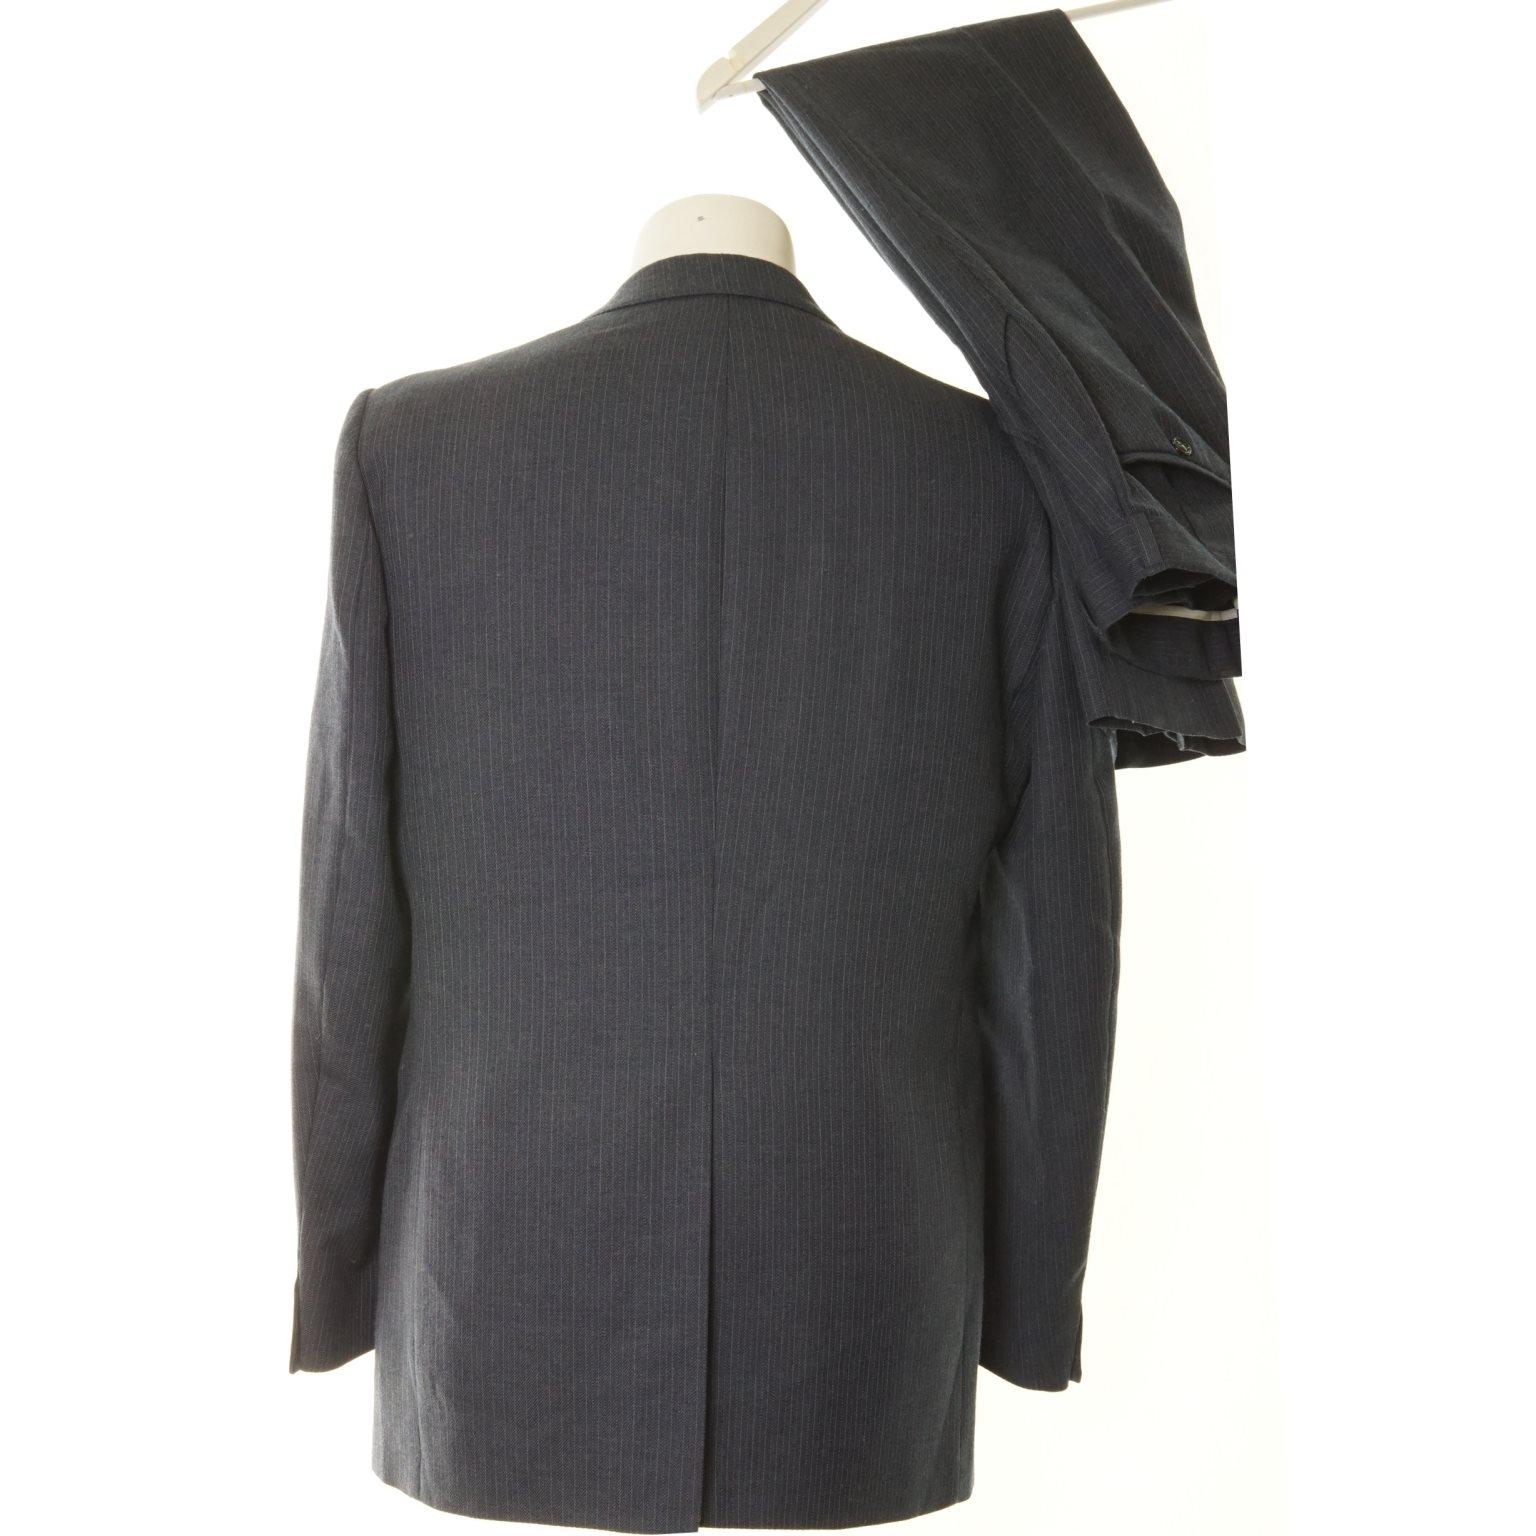 Den Fantastiska Fantastiska Fantastiska Kostymen, Kostym, Strl: 48, Mörkblå, Ull/Polyester 0b1ec9